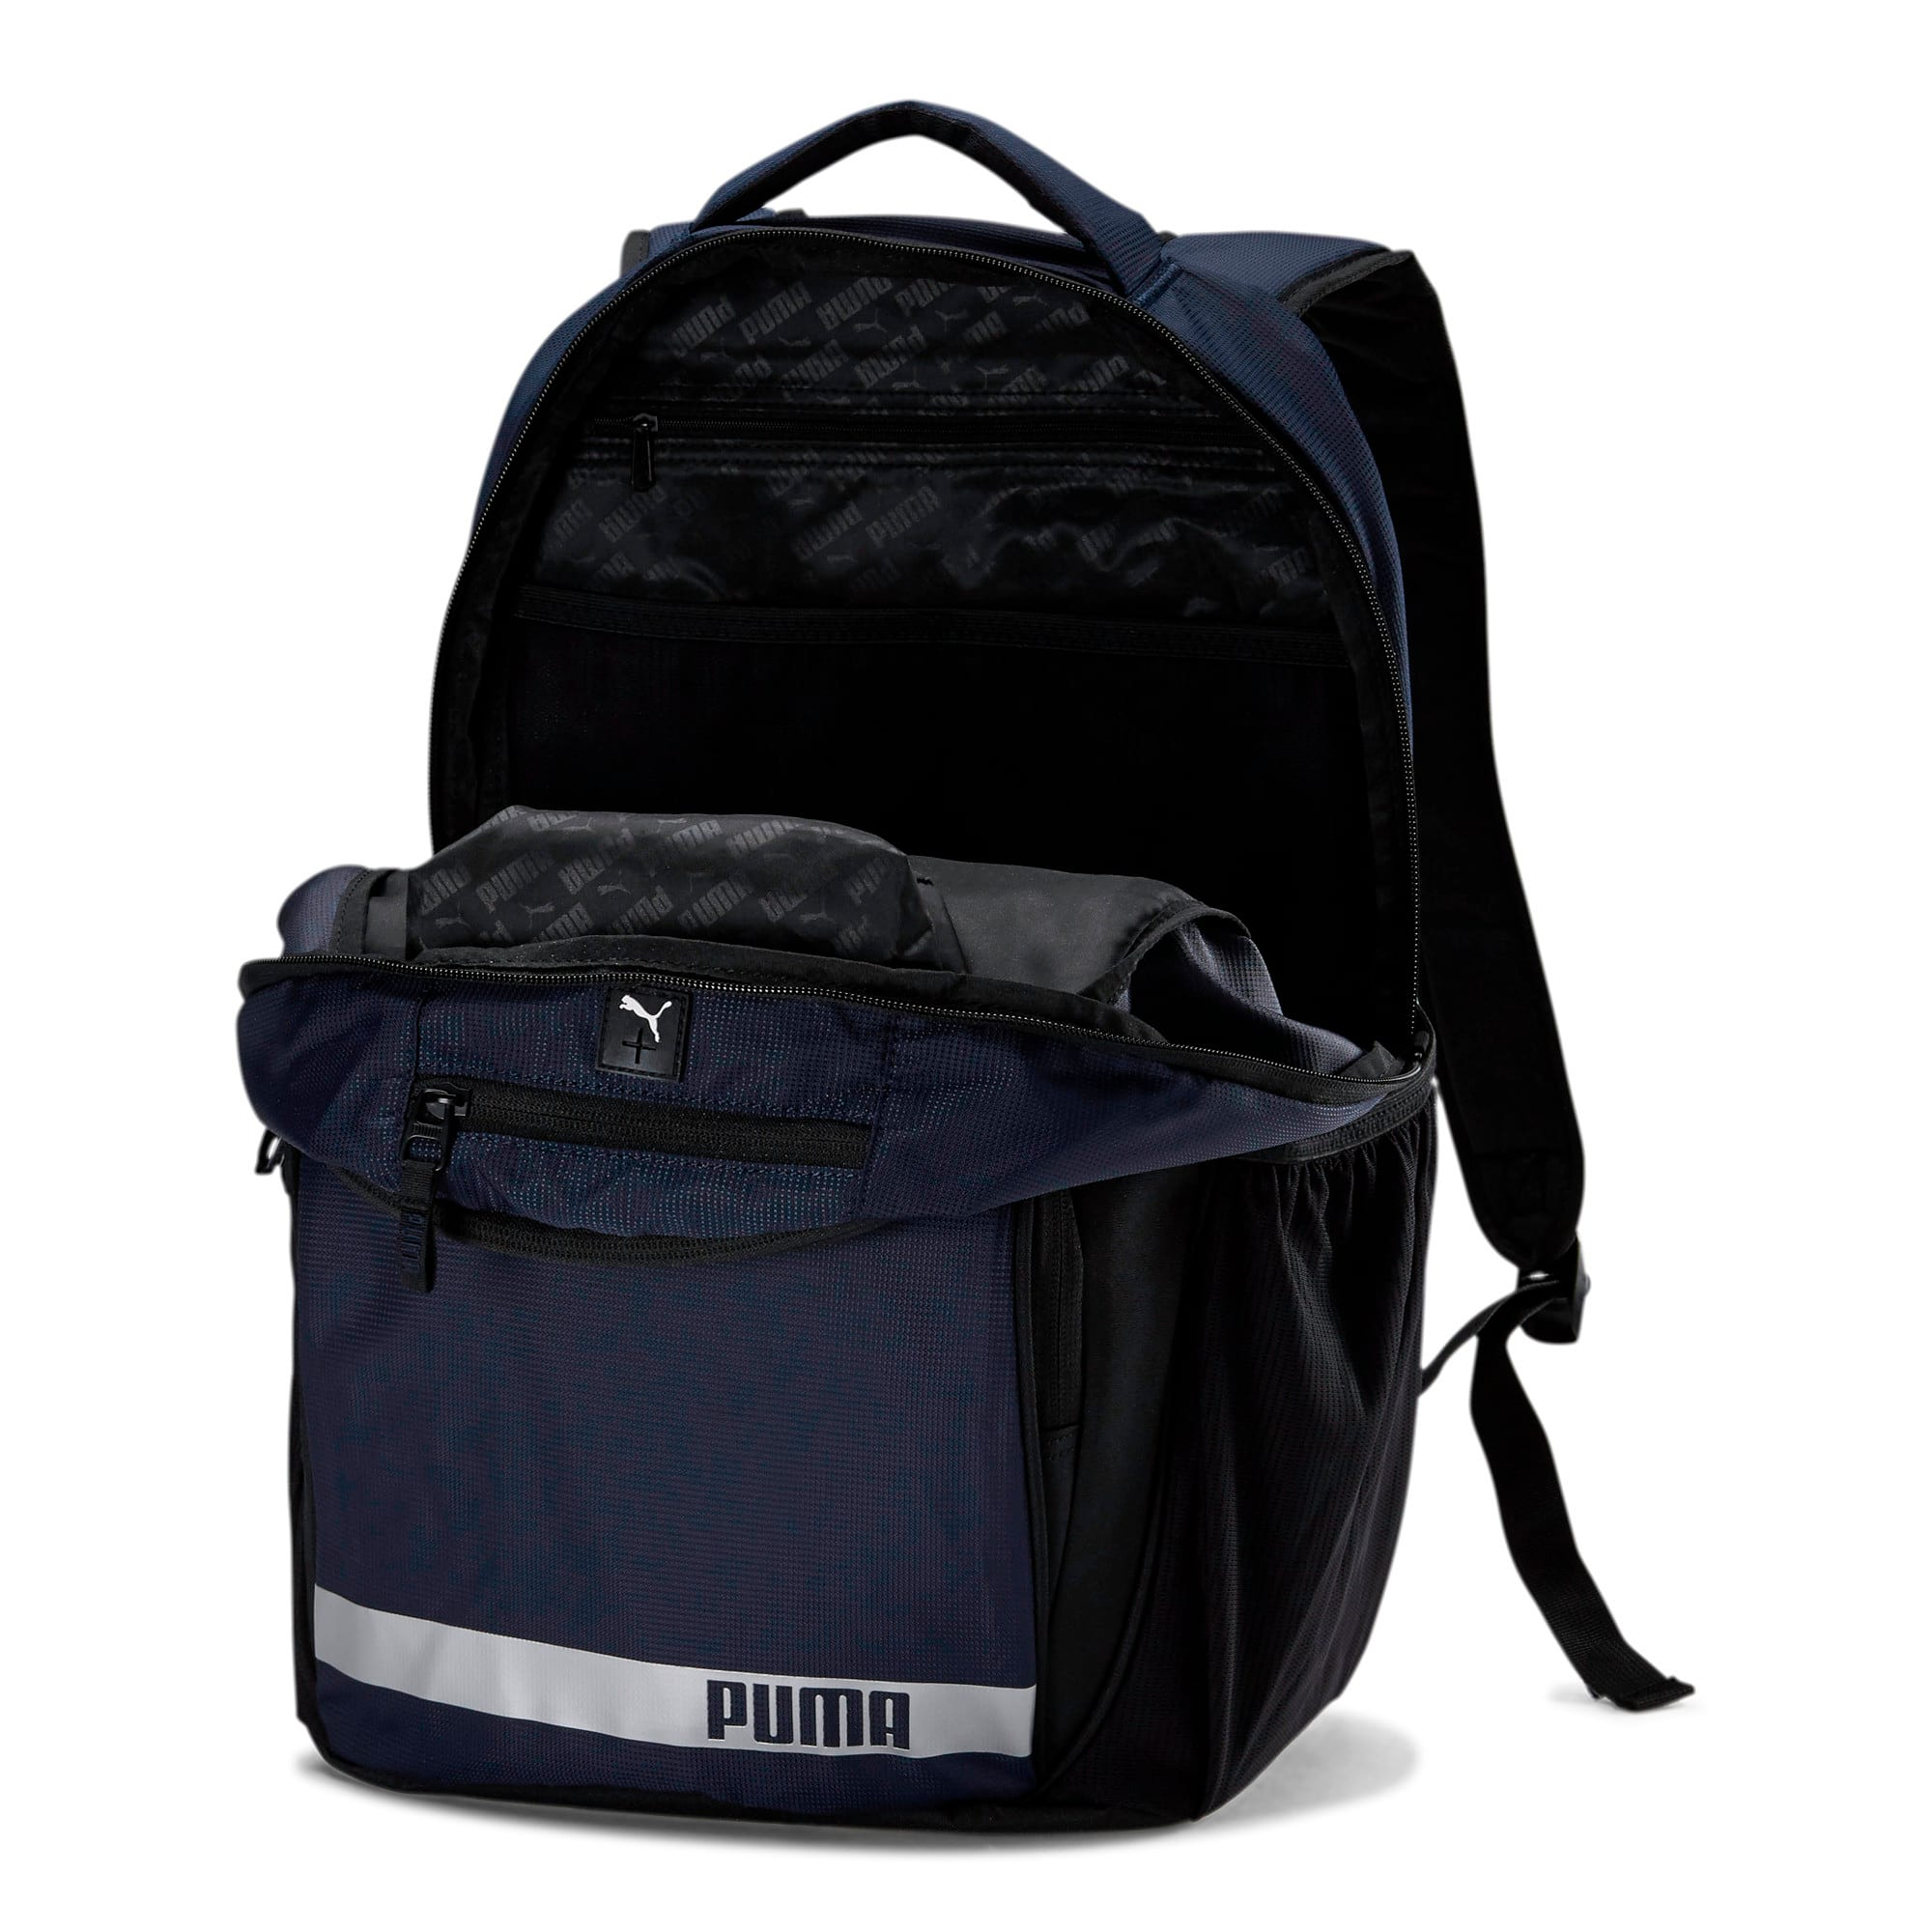 Thumbnail 3 of Formation 2.0 Ball Backpack, Navy, medium